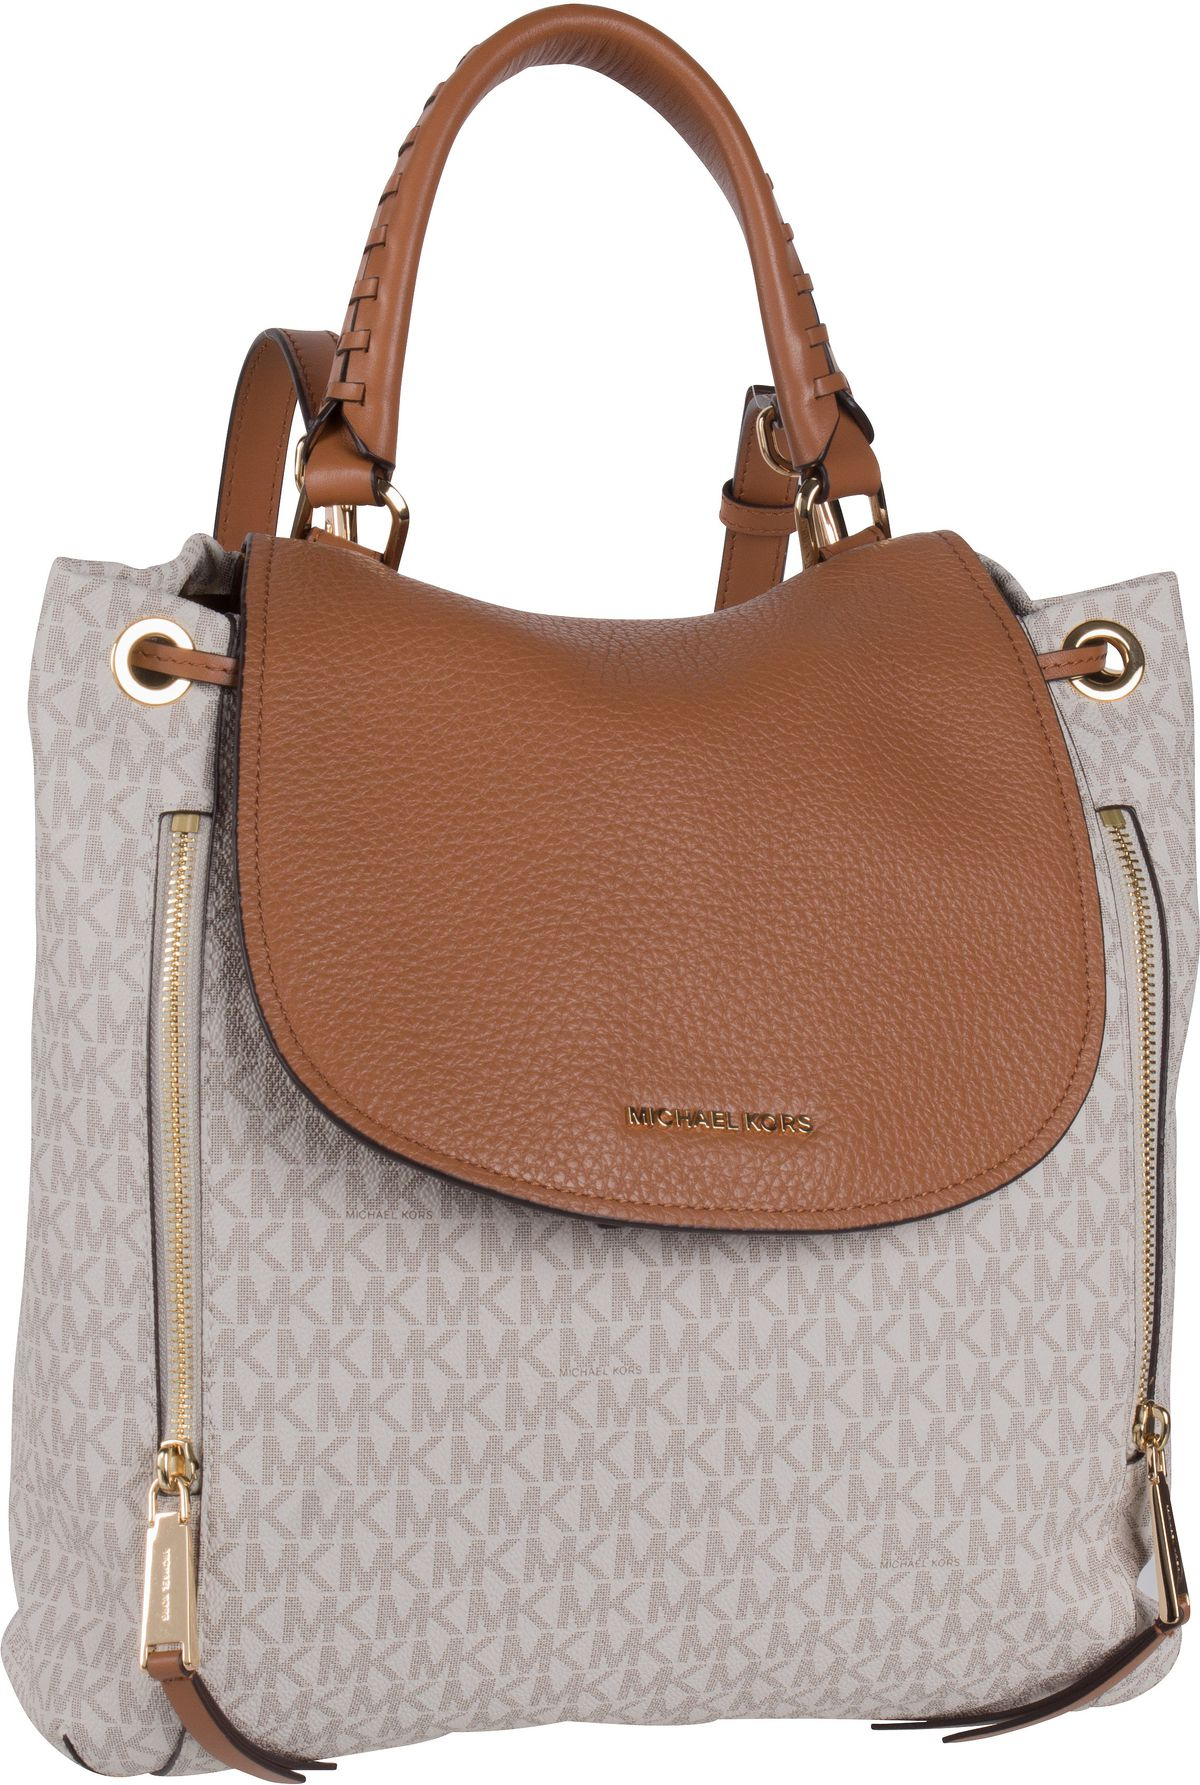 Rucksaecke - Michael Kors Rucksack Daypack Viv Large Backpack MK Signature Vanilla Acorn  - Onlineshop Taschenkaufhaus